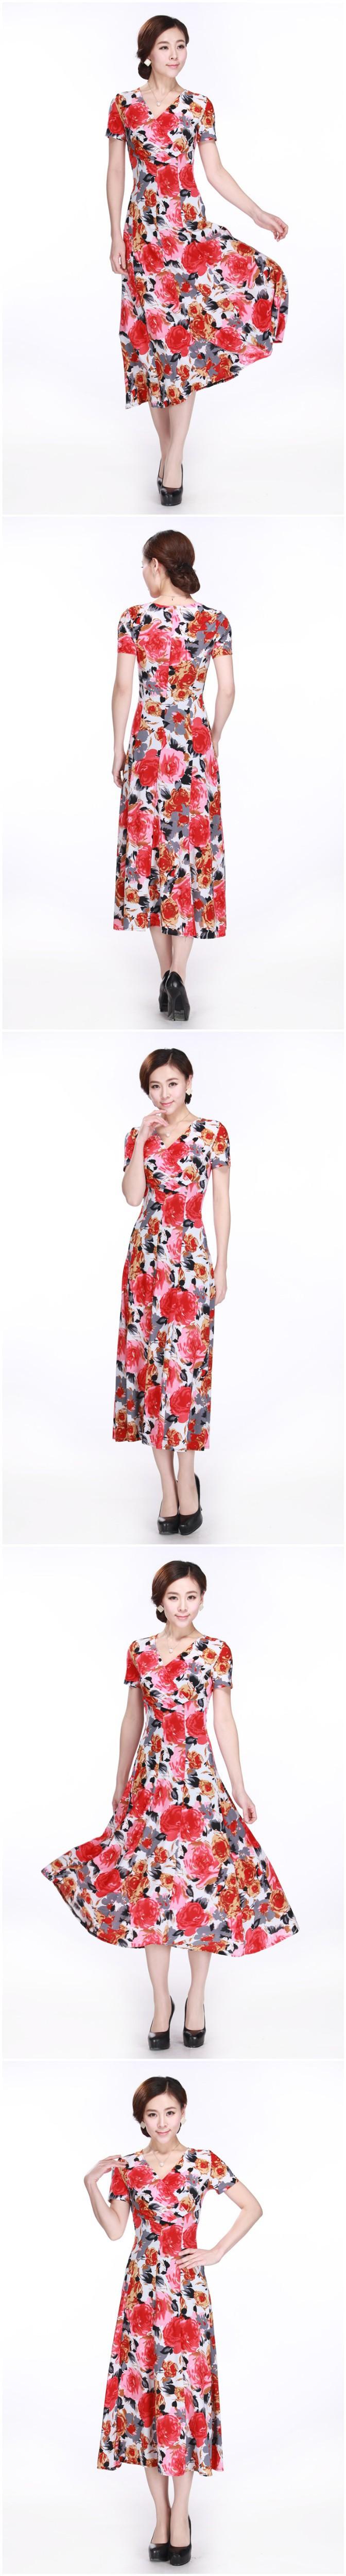 Женское платье BEN B050614 XXXXL